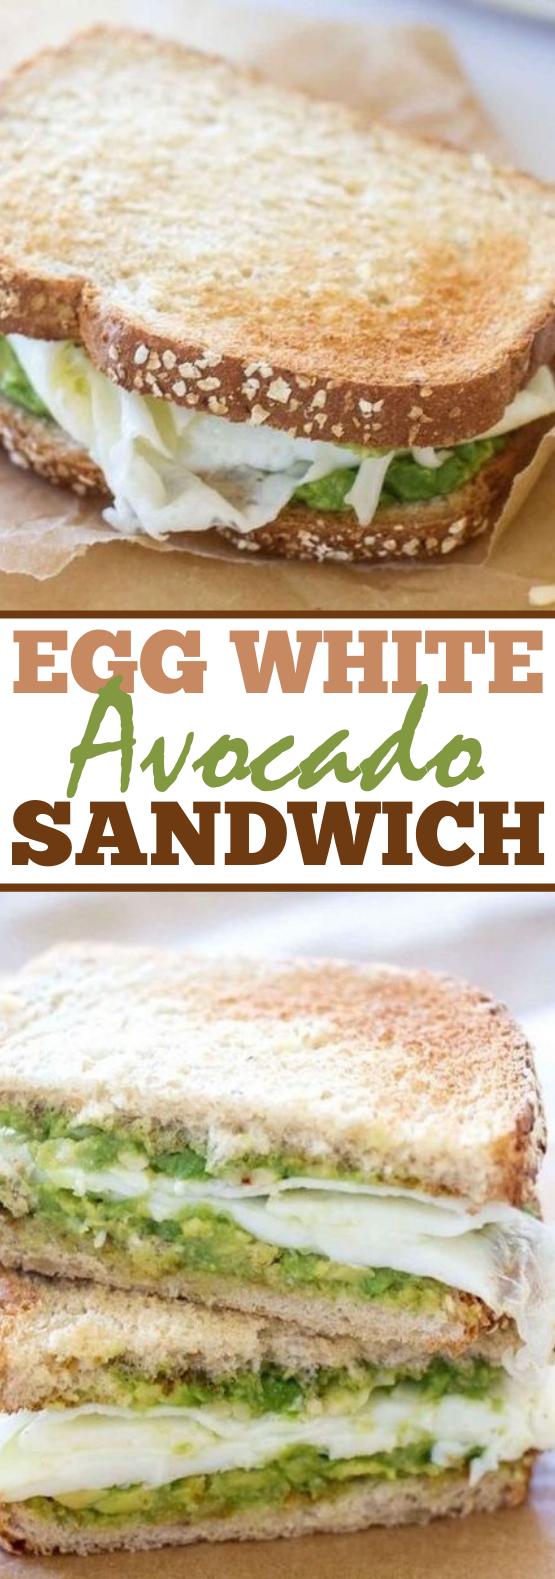 Egg White and Avocado Breakfast Sandwich #healthy #breakfast #lunch #sandwich #highprotein